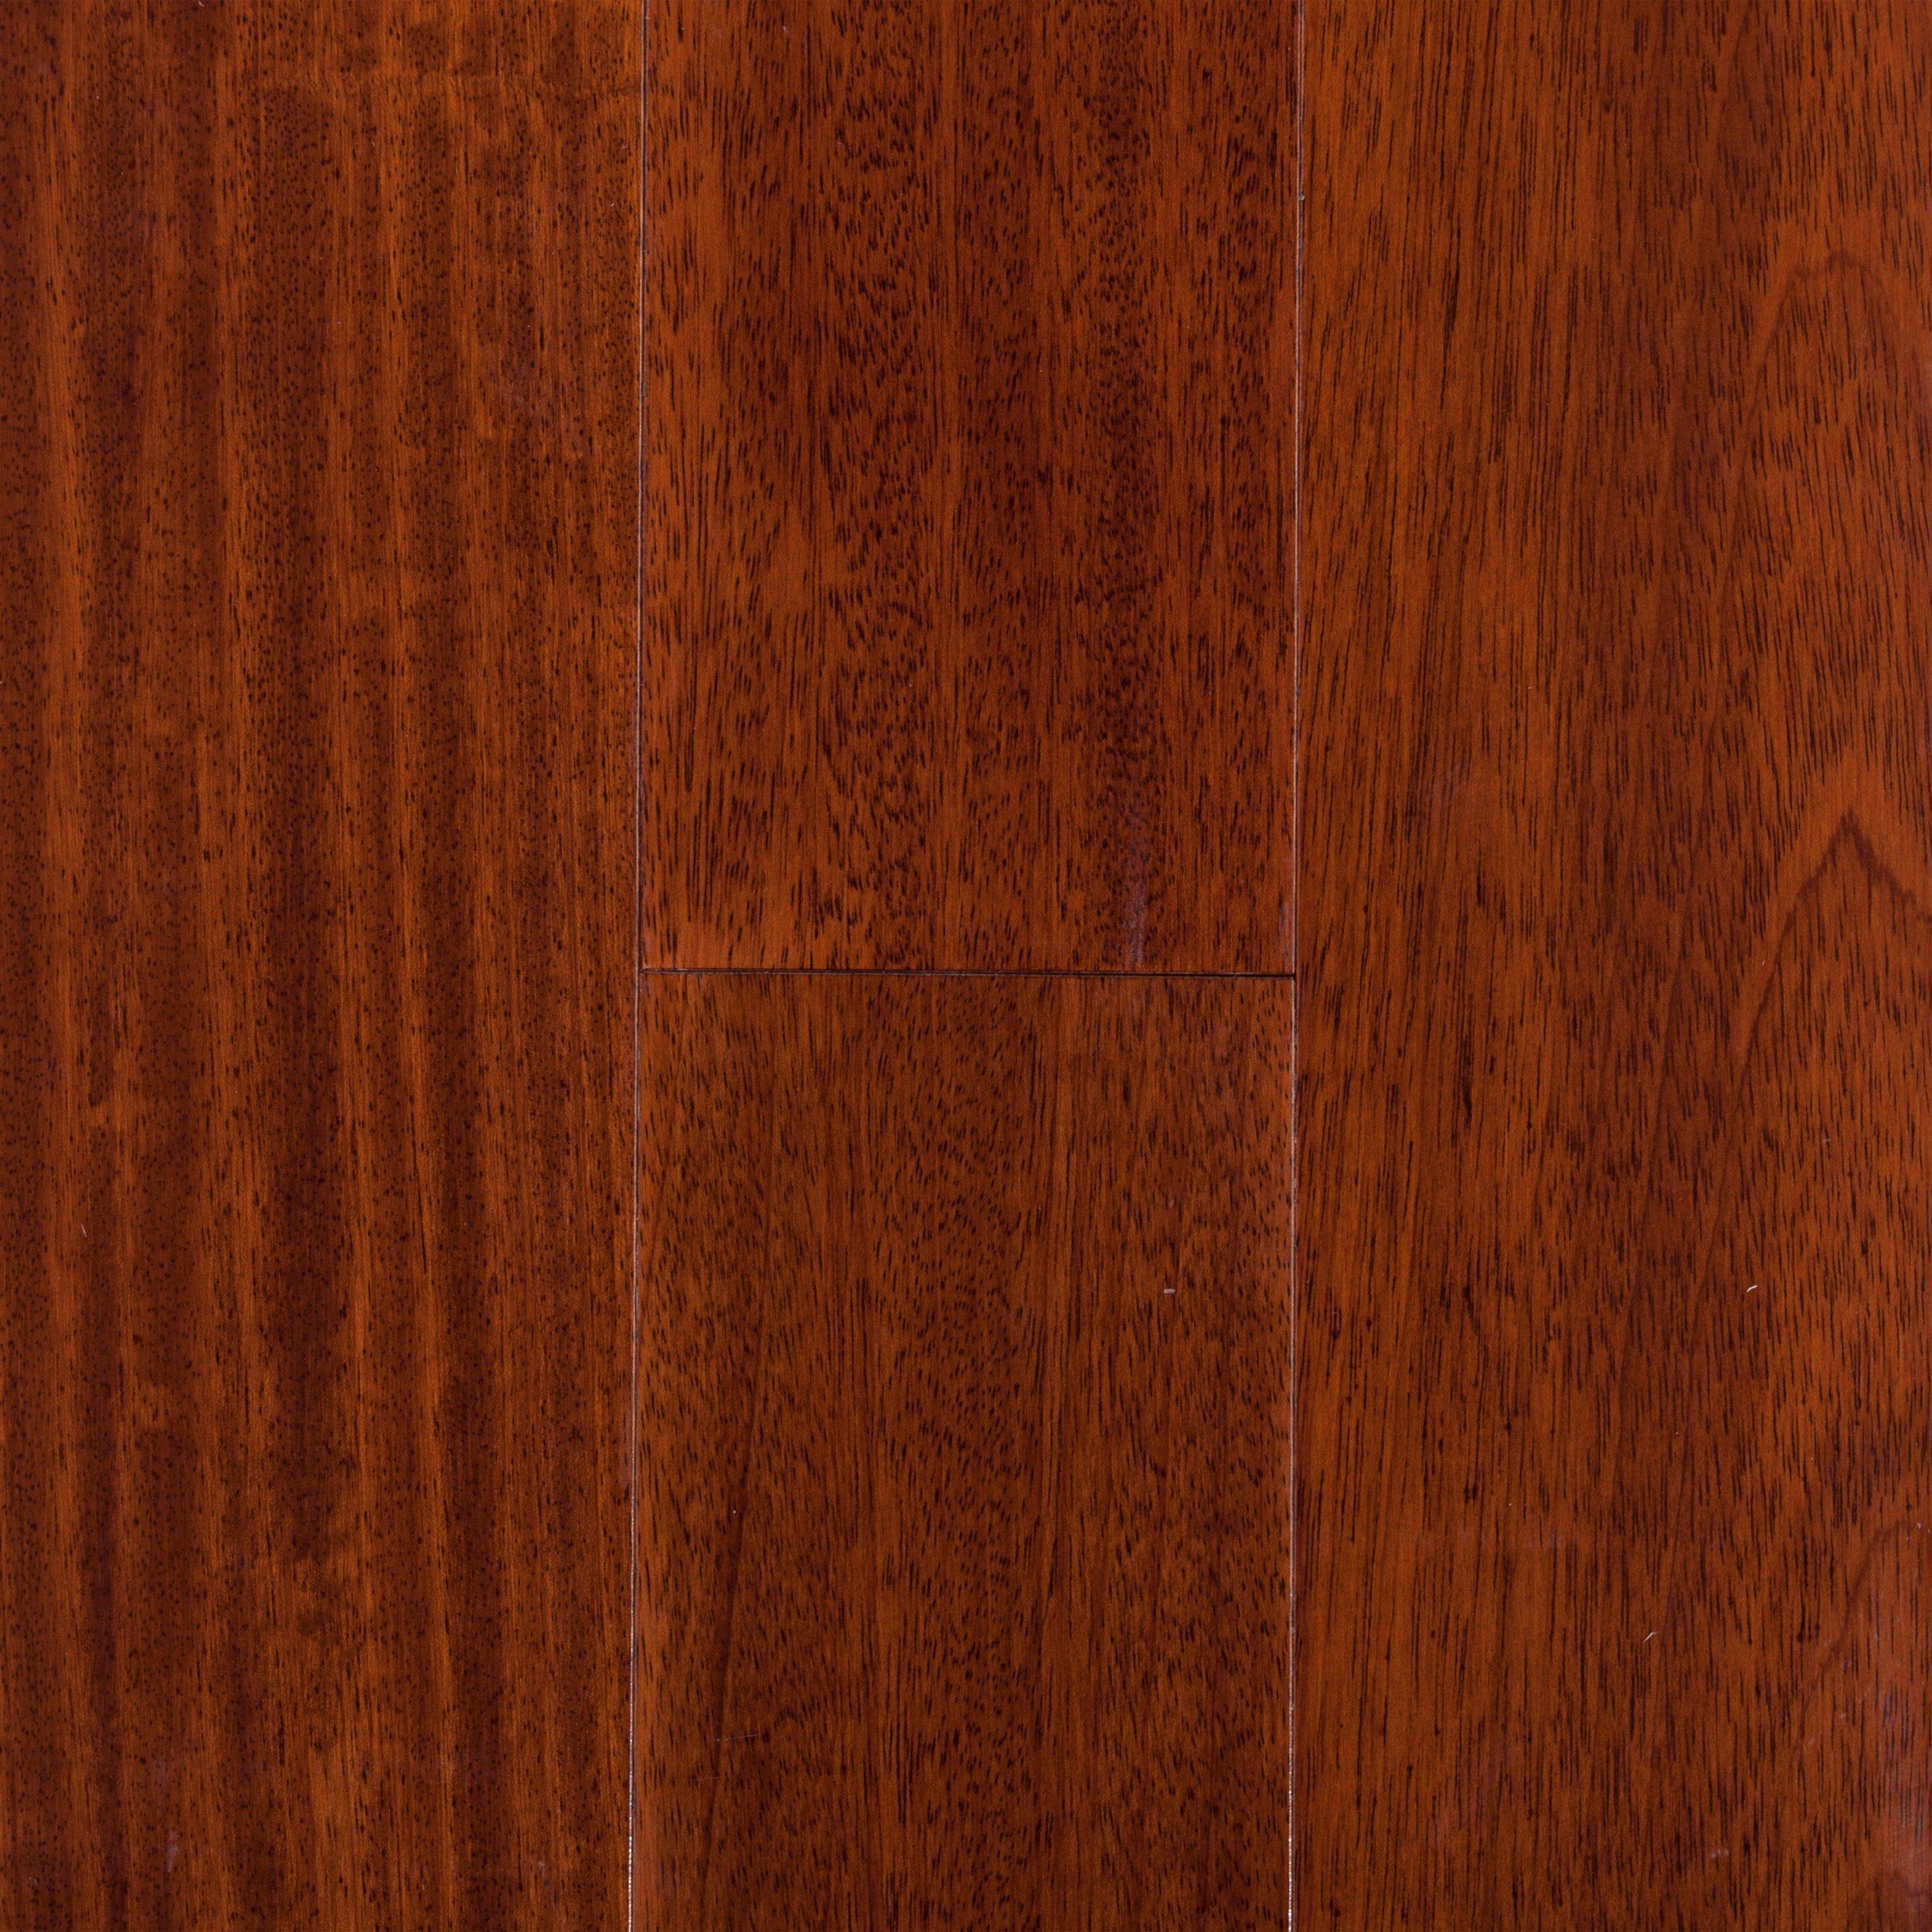 Brazilian cherry hardwood take home sample brazilian for Brazilian cherry hardwood flooring